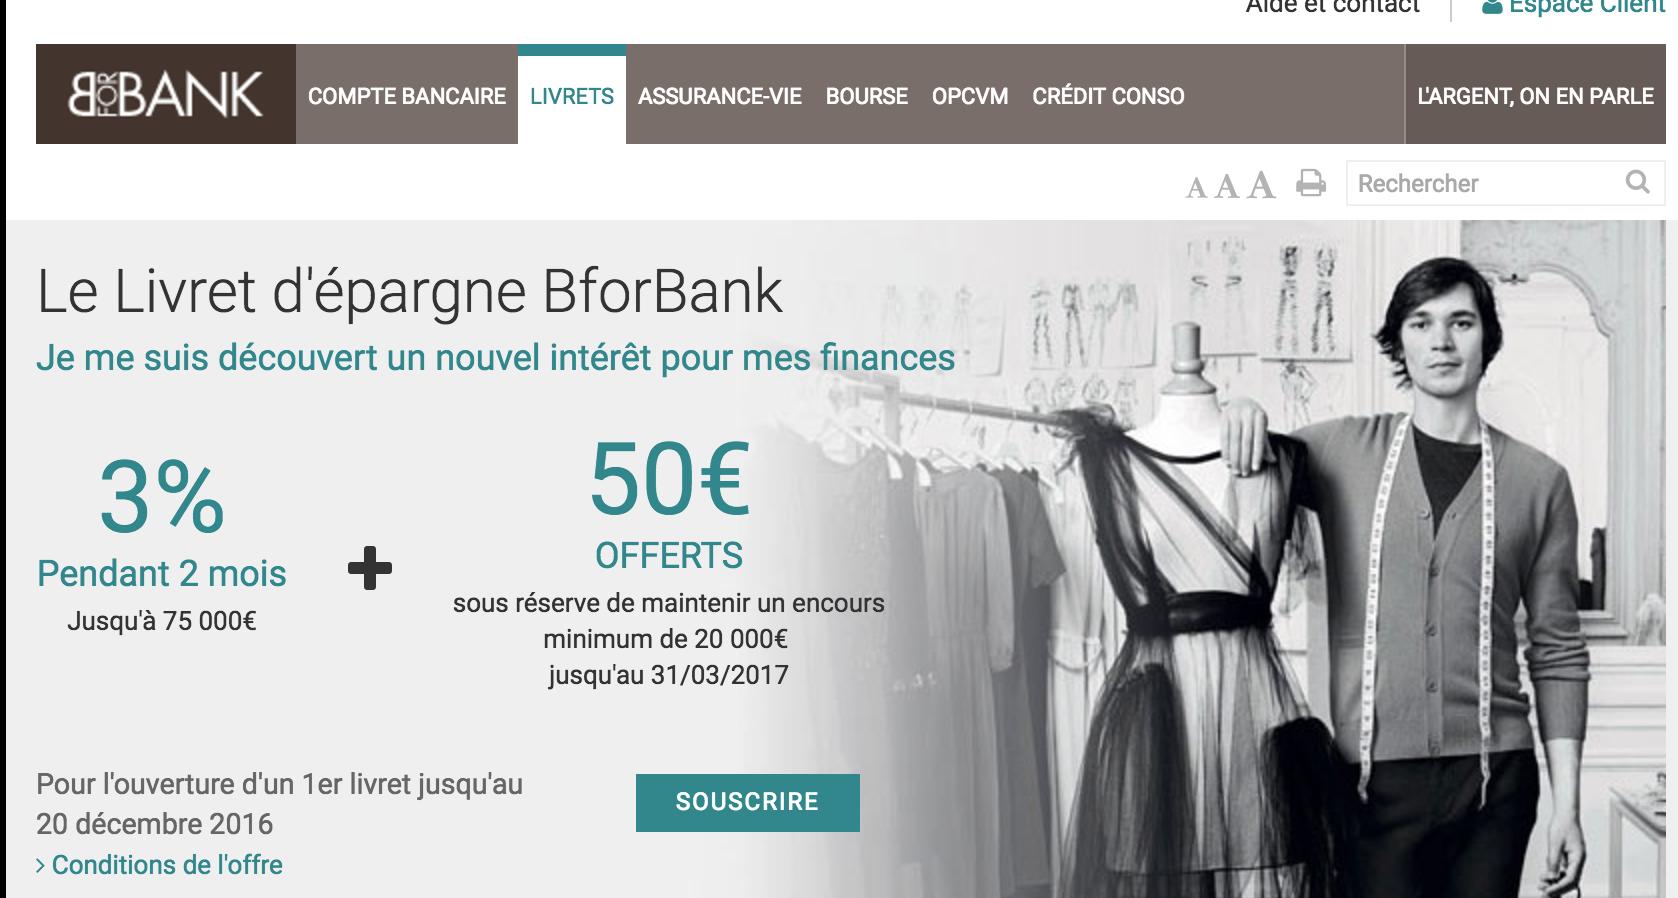 Baisse du Livret Epargne BforBank à 0,4% brut